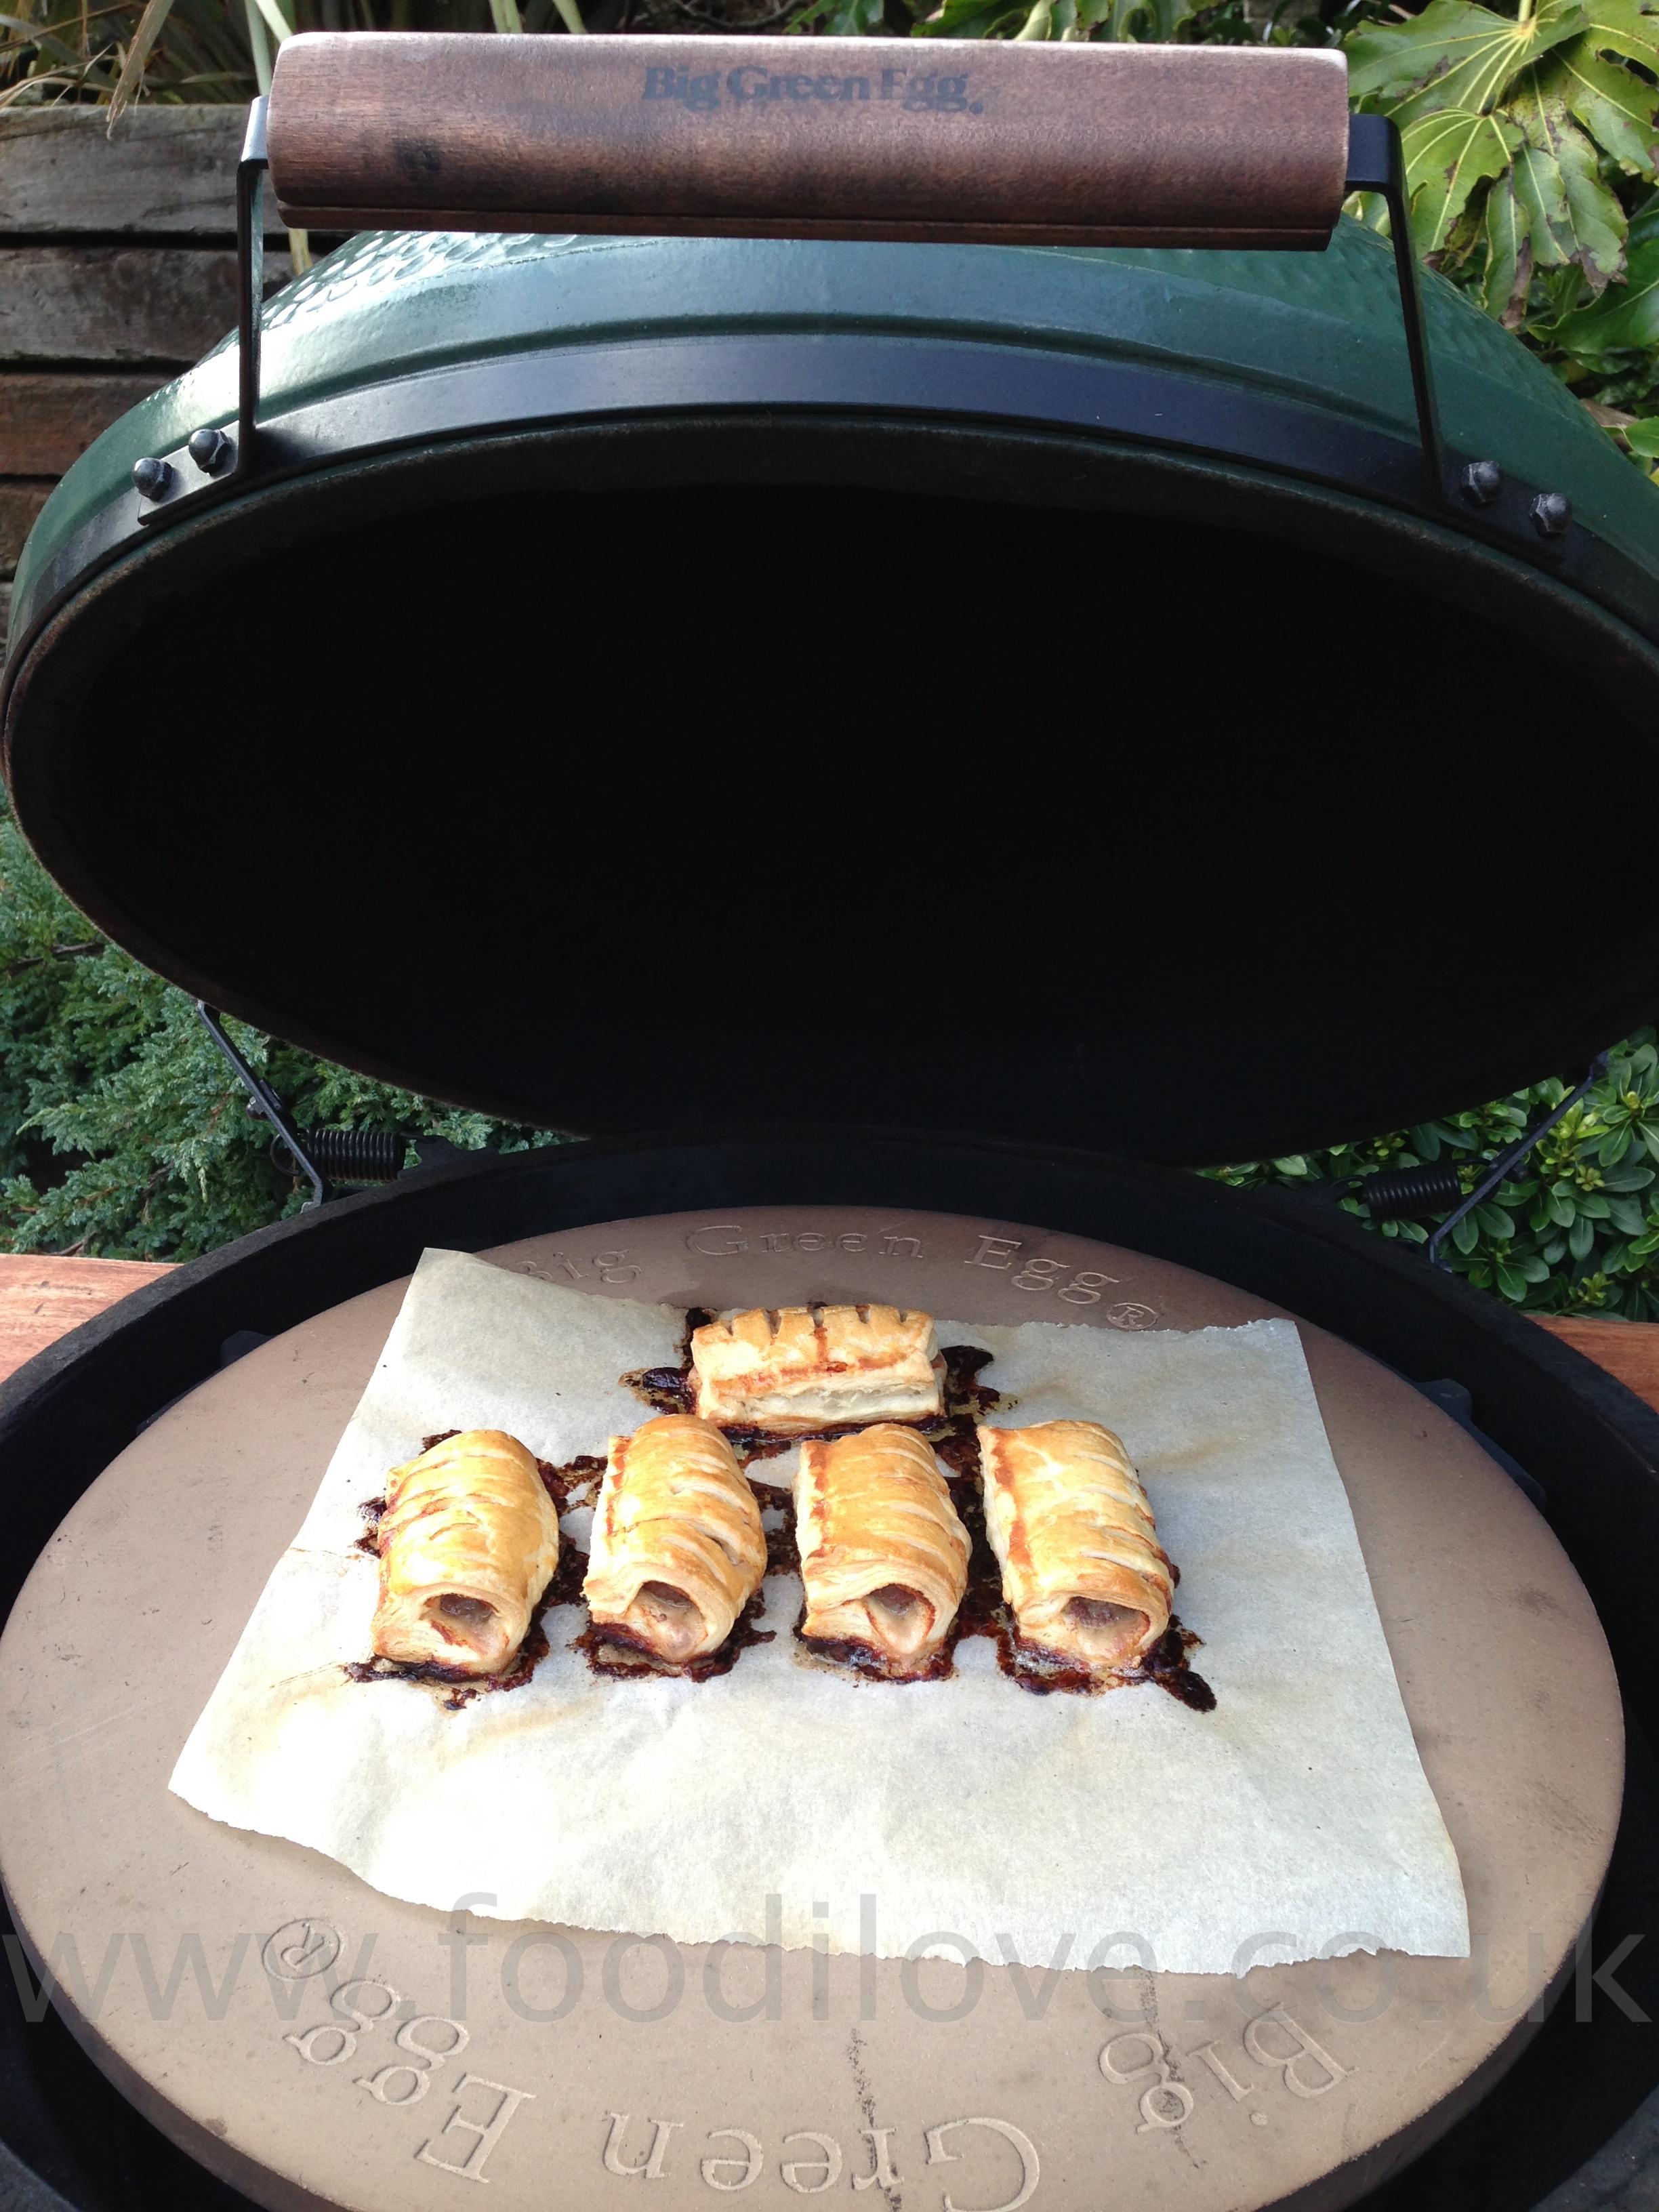 Cheese & Garlic Boerewors Sausage Rolls cooked on the Braai/BigGreenEgg